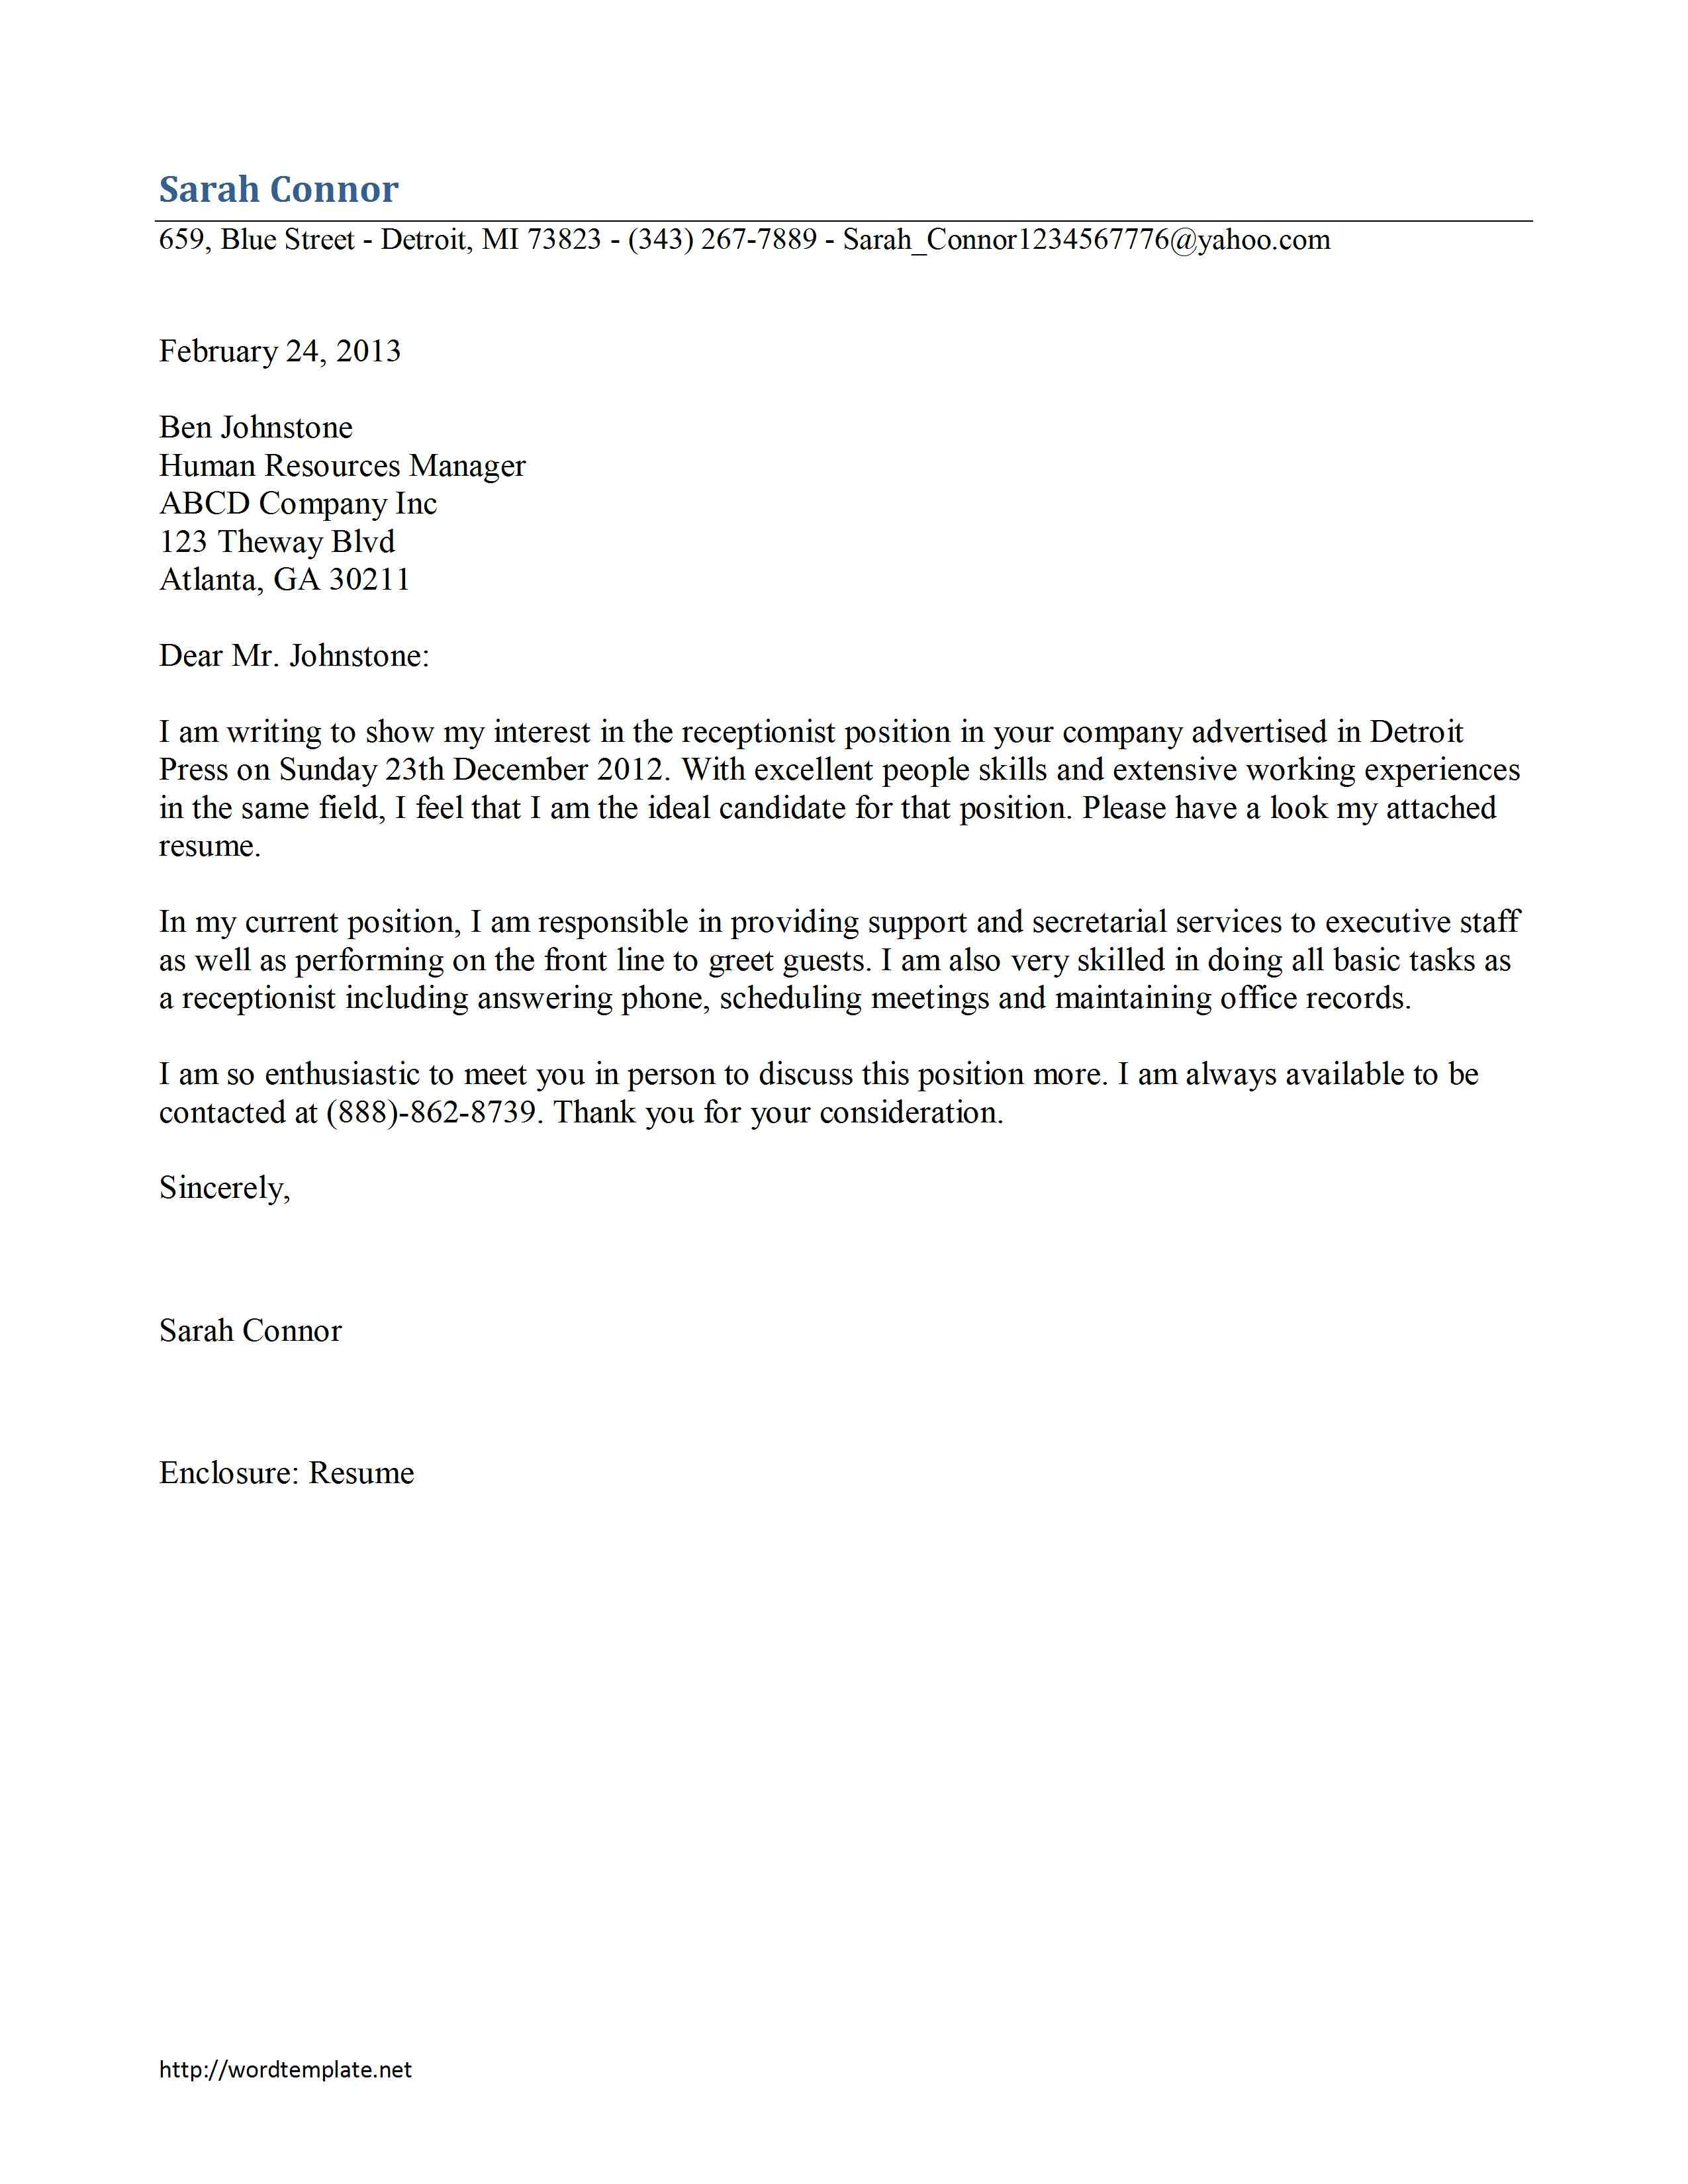 Samples Cover Letter For Receptionist Job Sample ResumesCover Letter Samples For Jobs